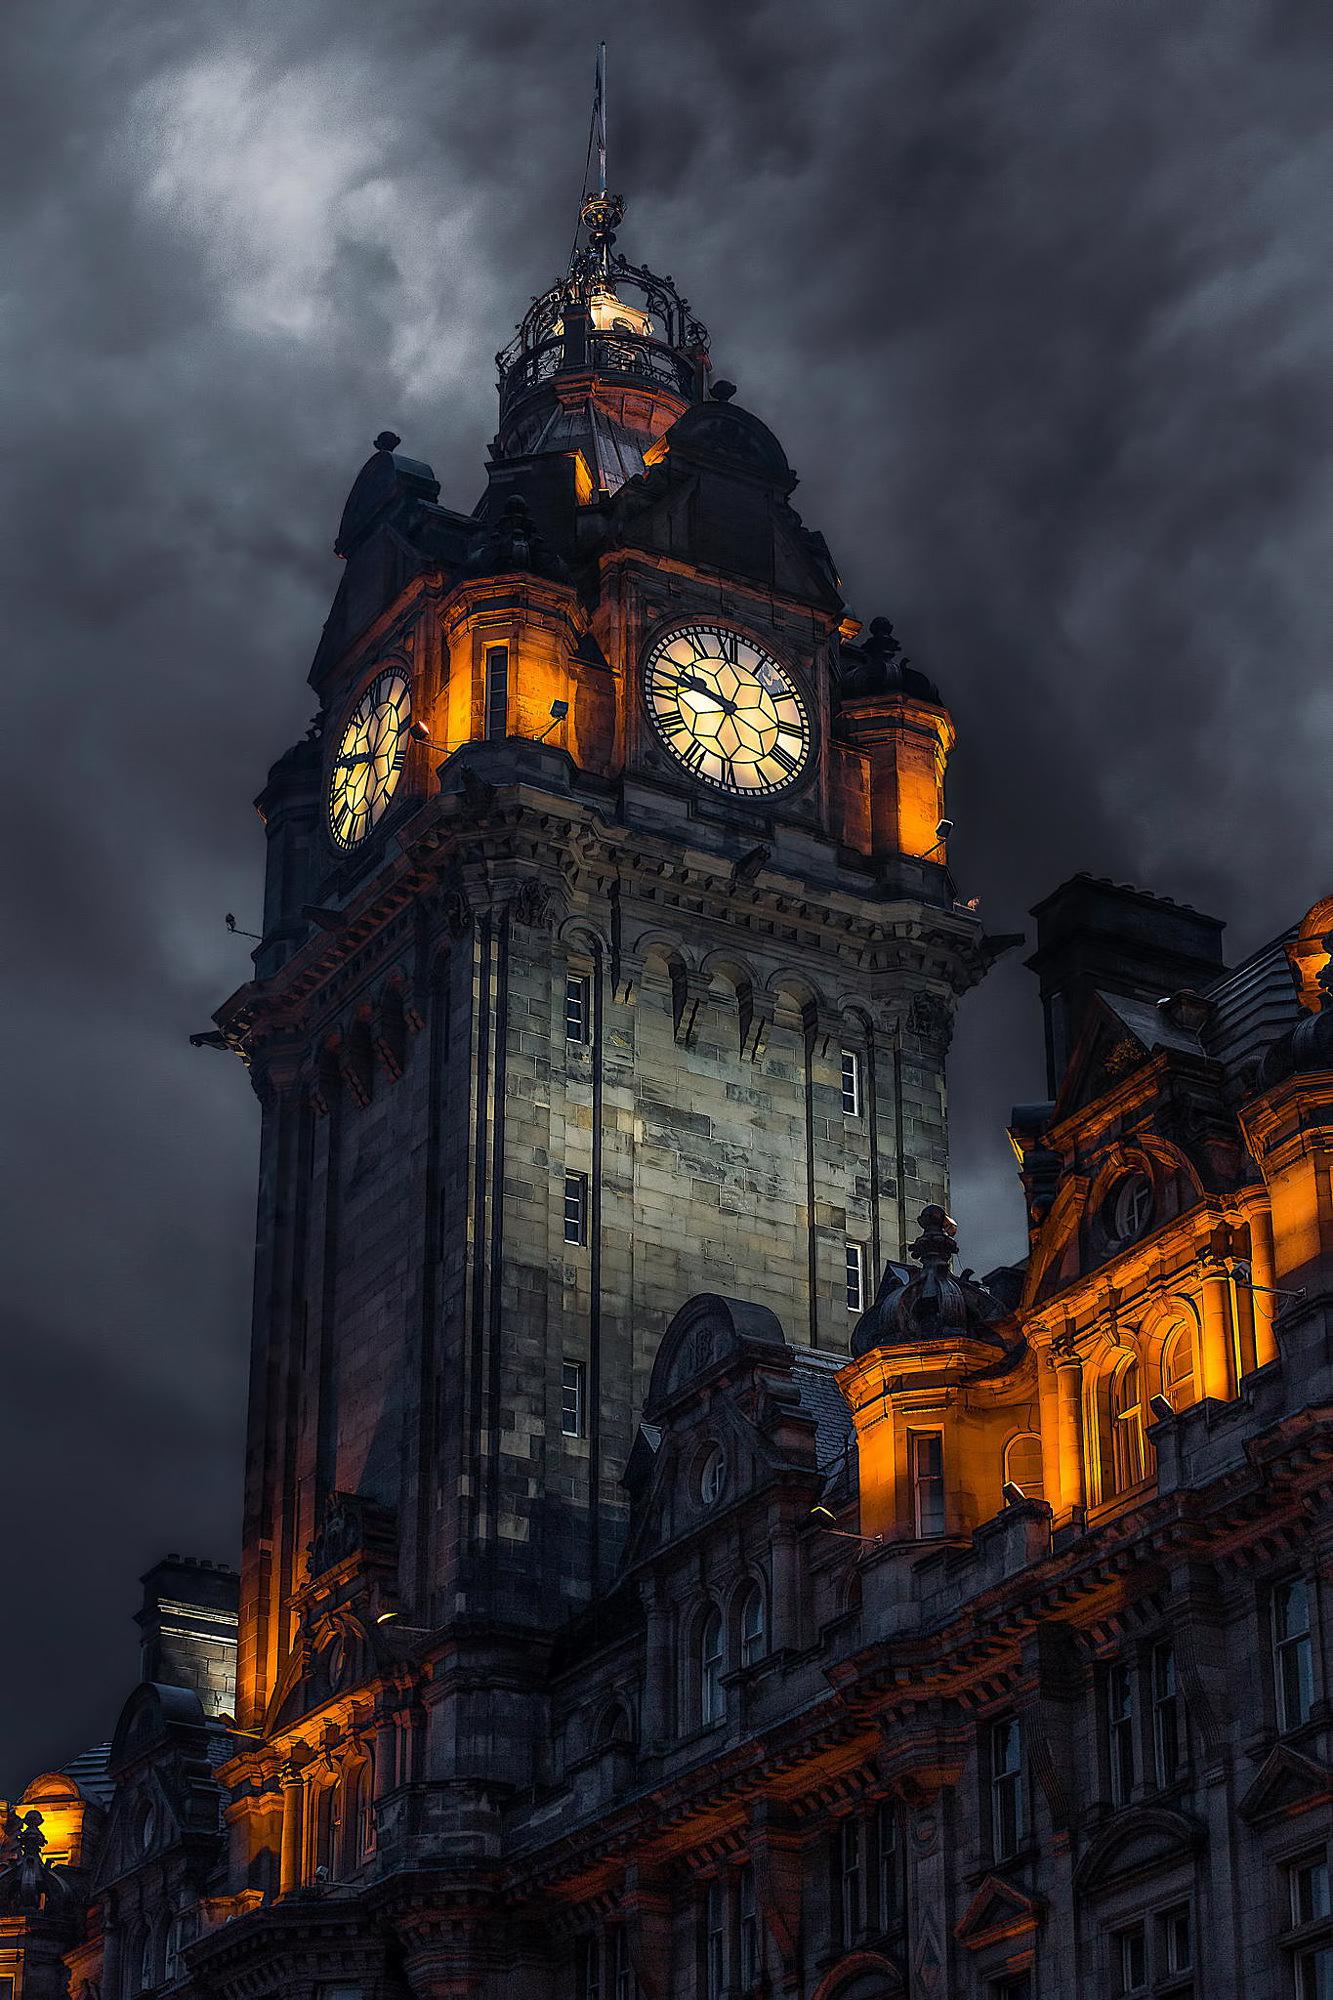 Clock Tower, Edinburgh, Scotland : evilbuildings